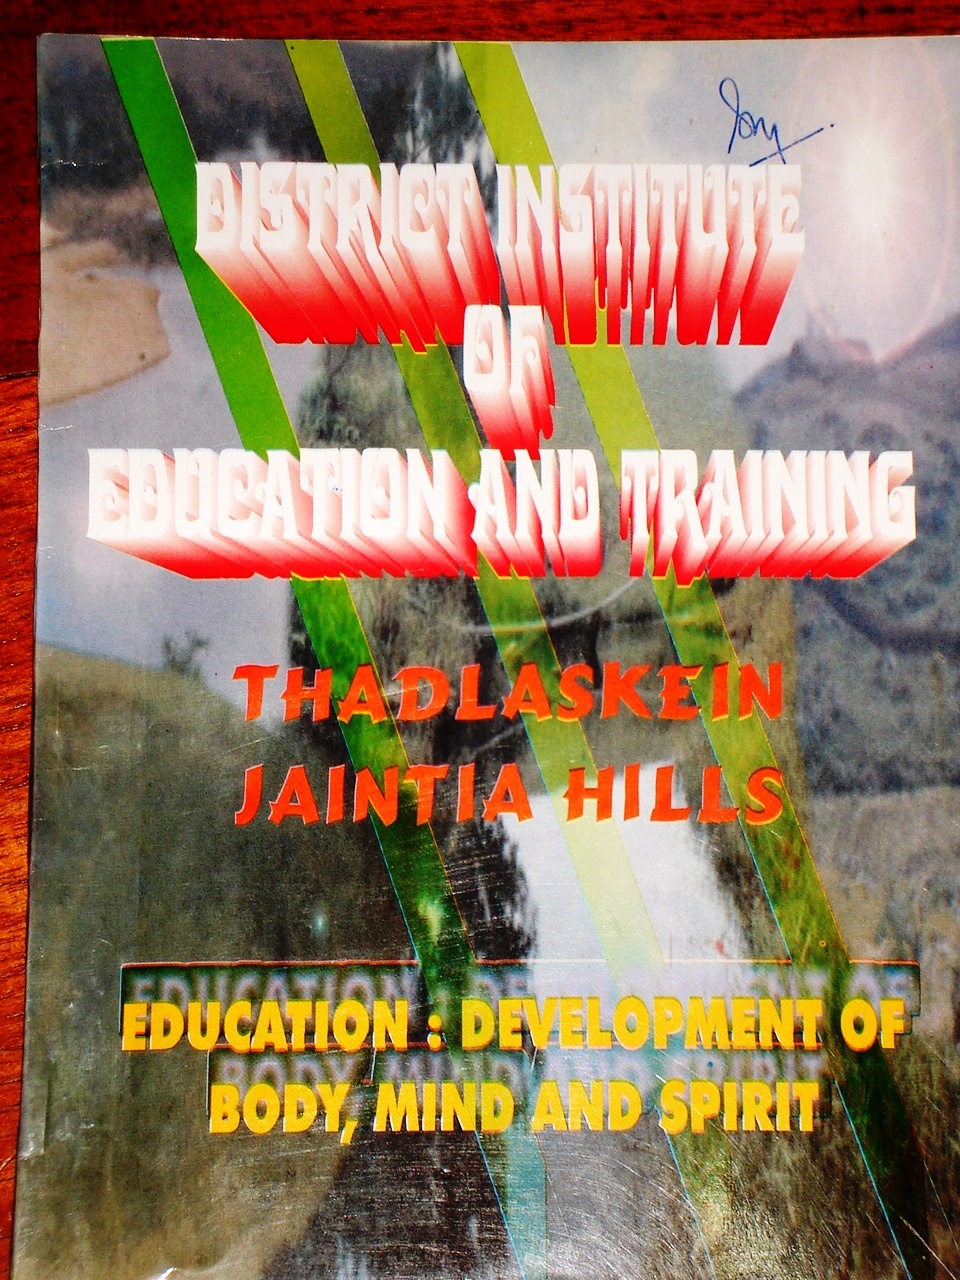 Education : Development Of Body Mind And Spirit